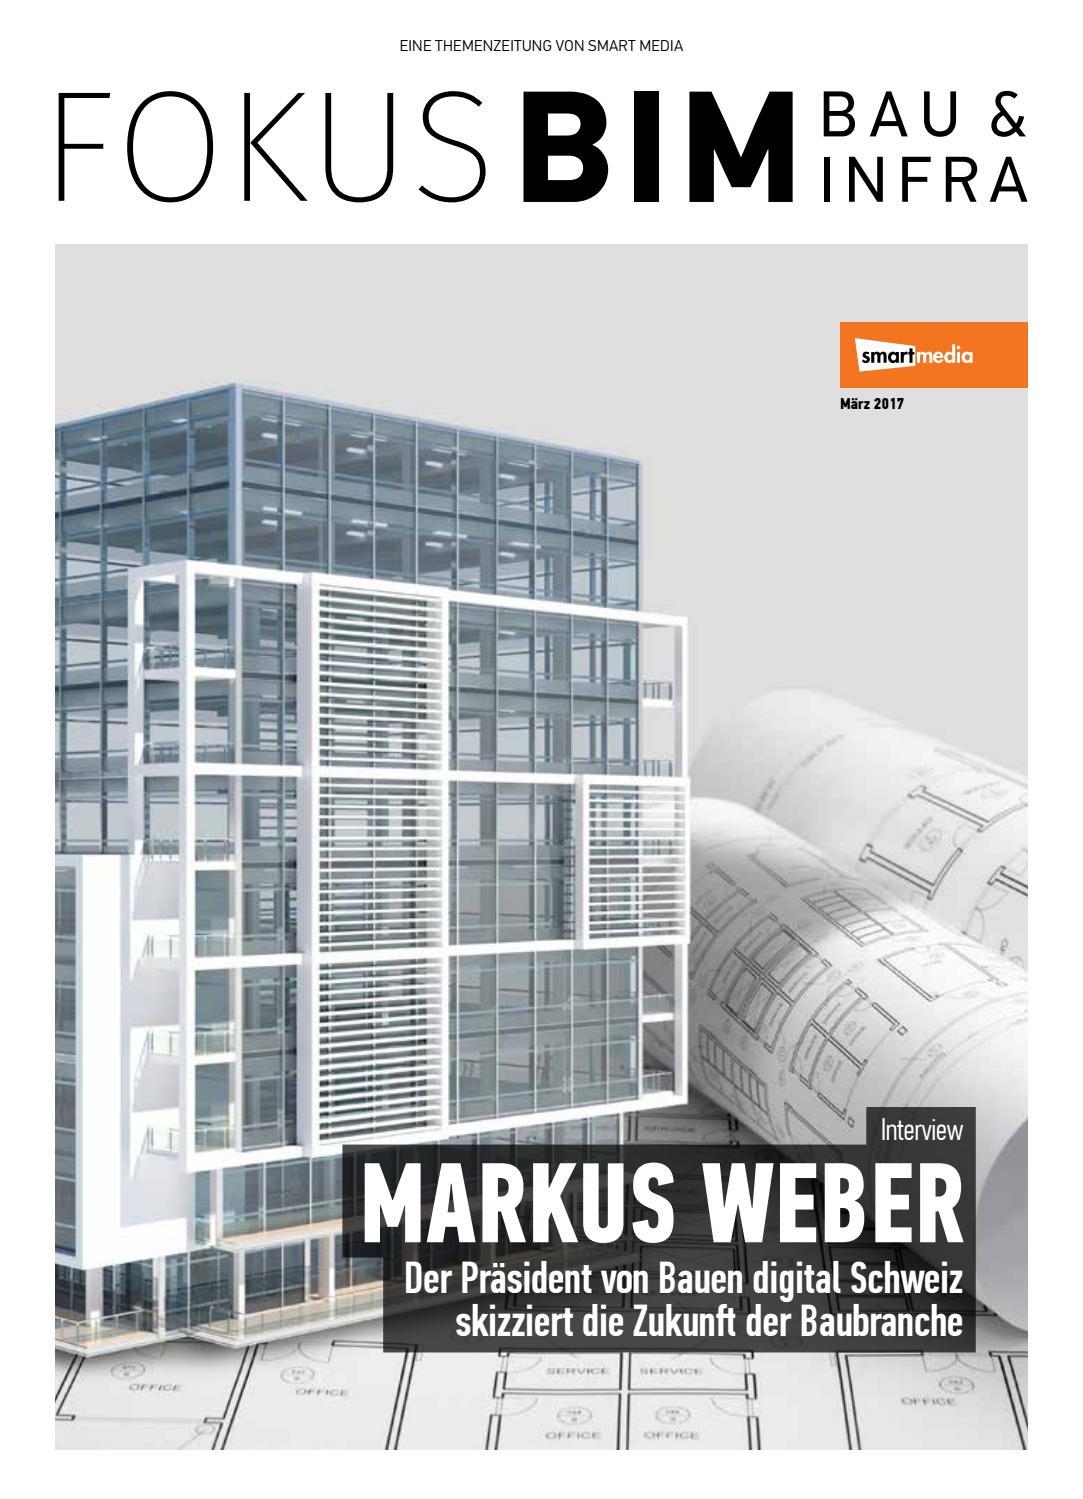 Fokus BIM Bau & Infra by Smart Media - issuu